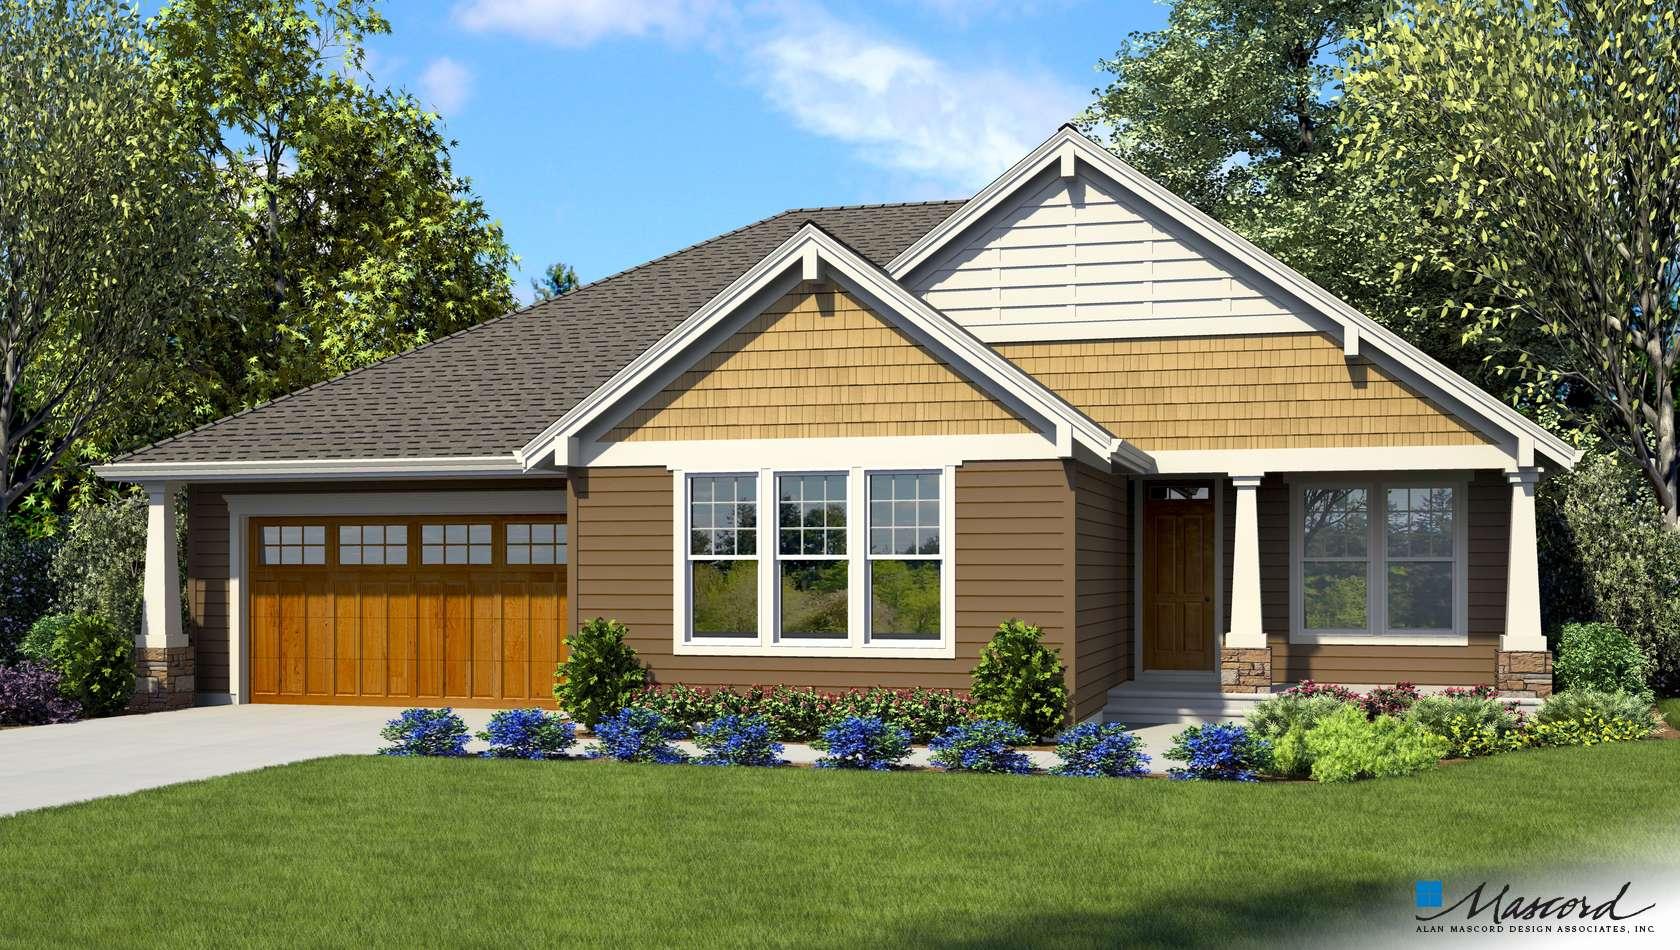 Mascord House Plan 1231Q: The Coopertown